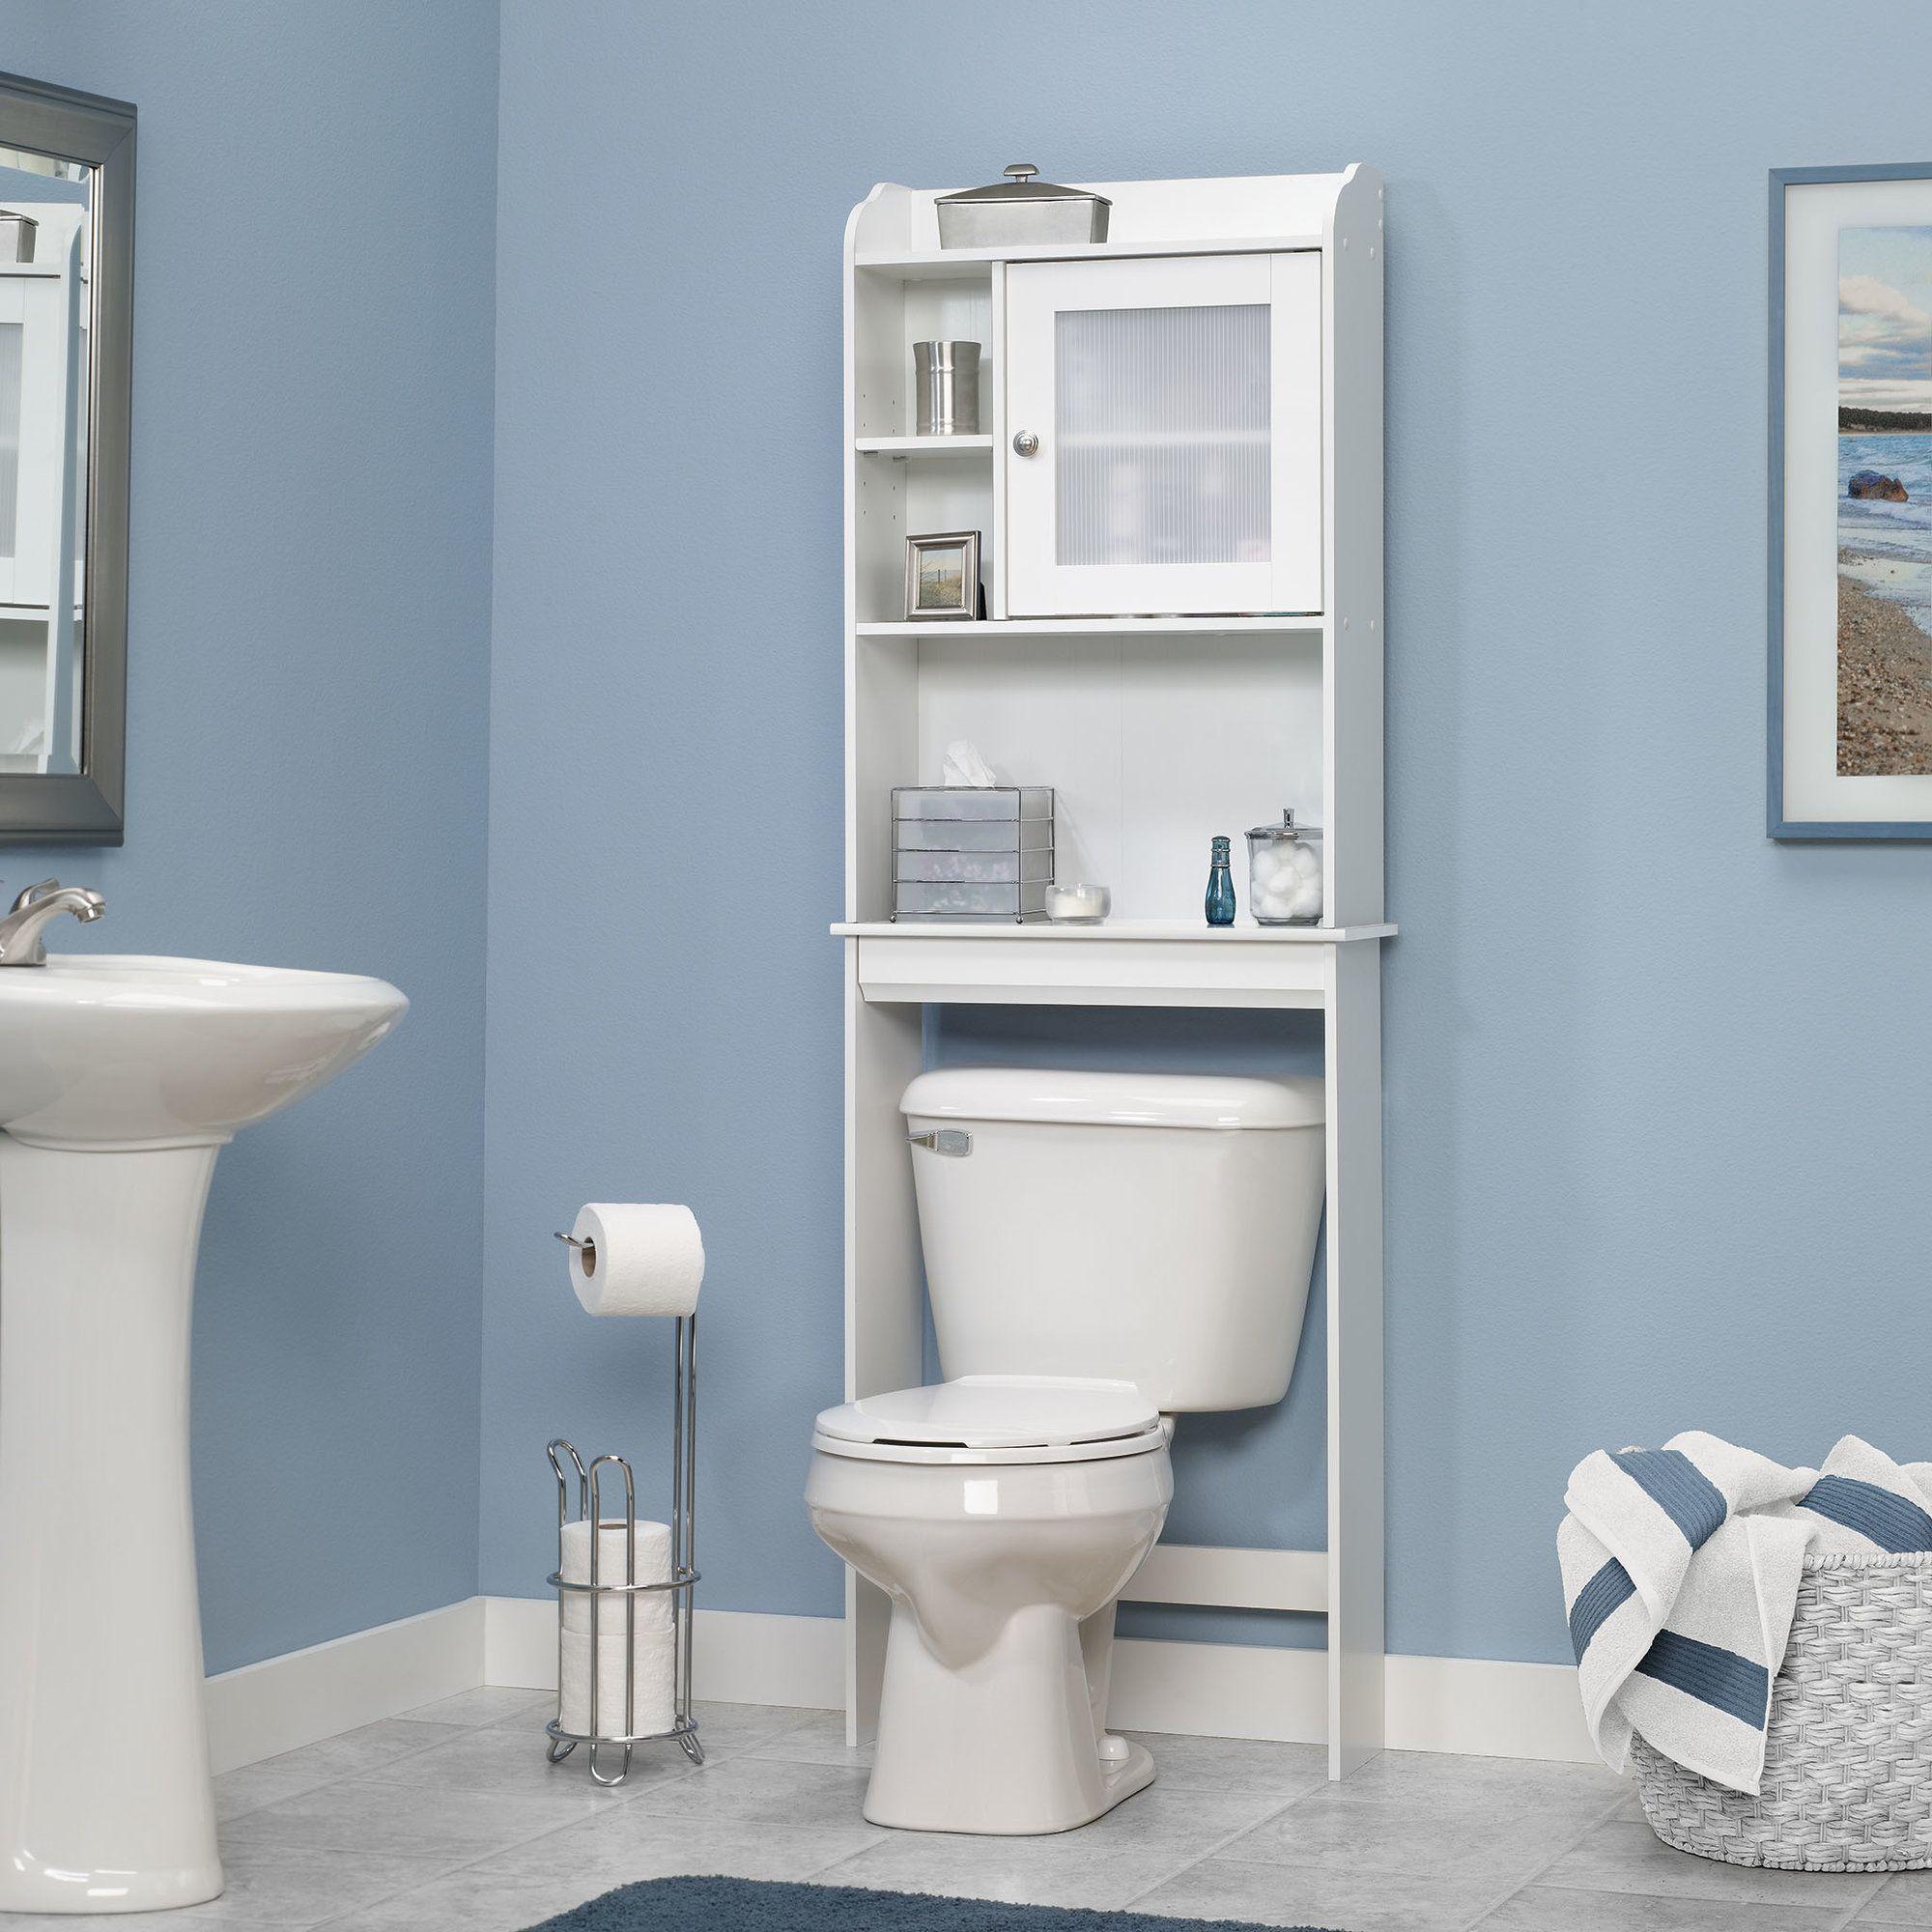 Caraway Over Tank Storage Shelf Bathroom Floor Cabinets Bathroom Shelf Decor Bathroom Space Saver